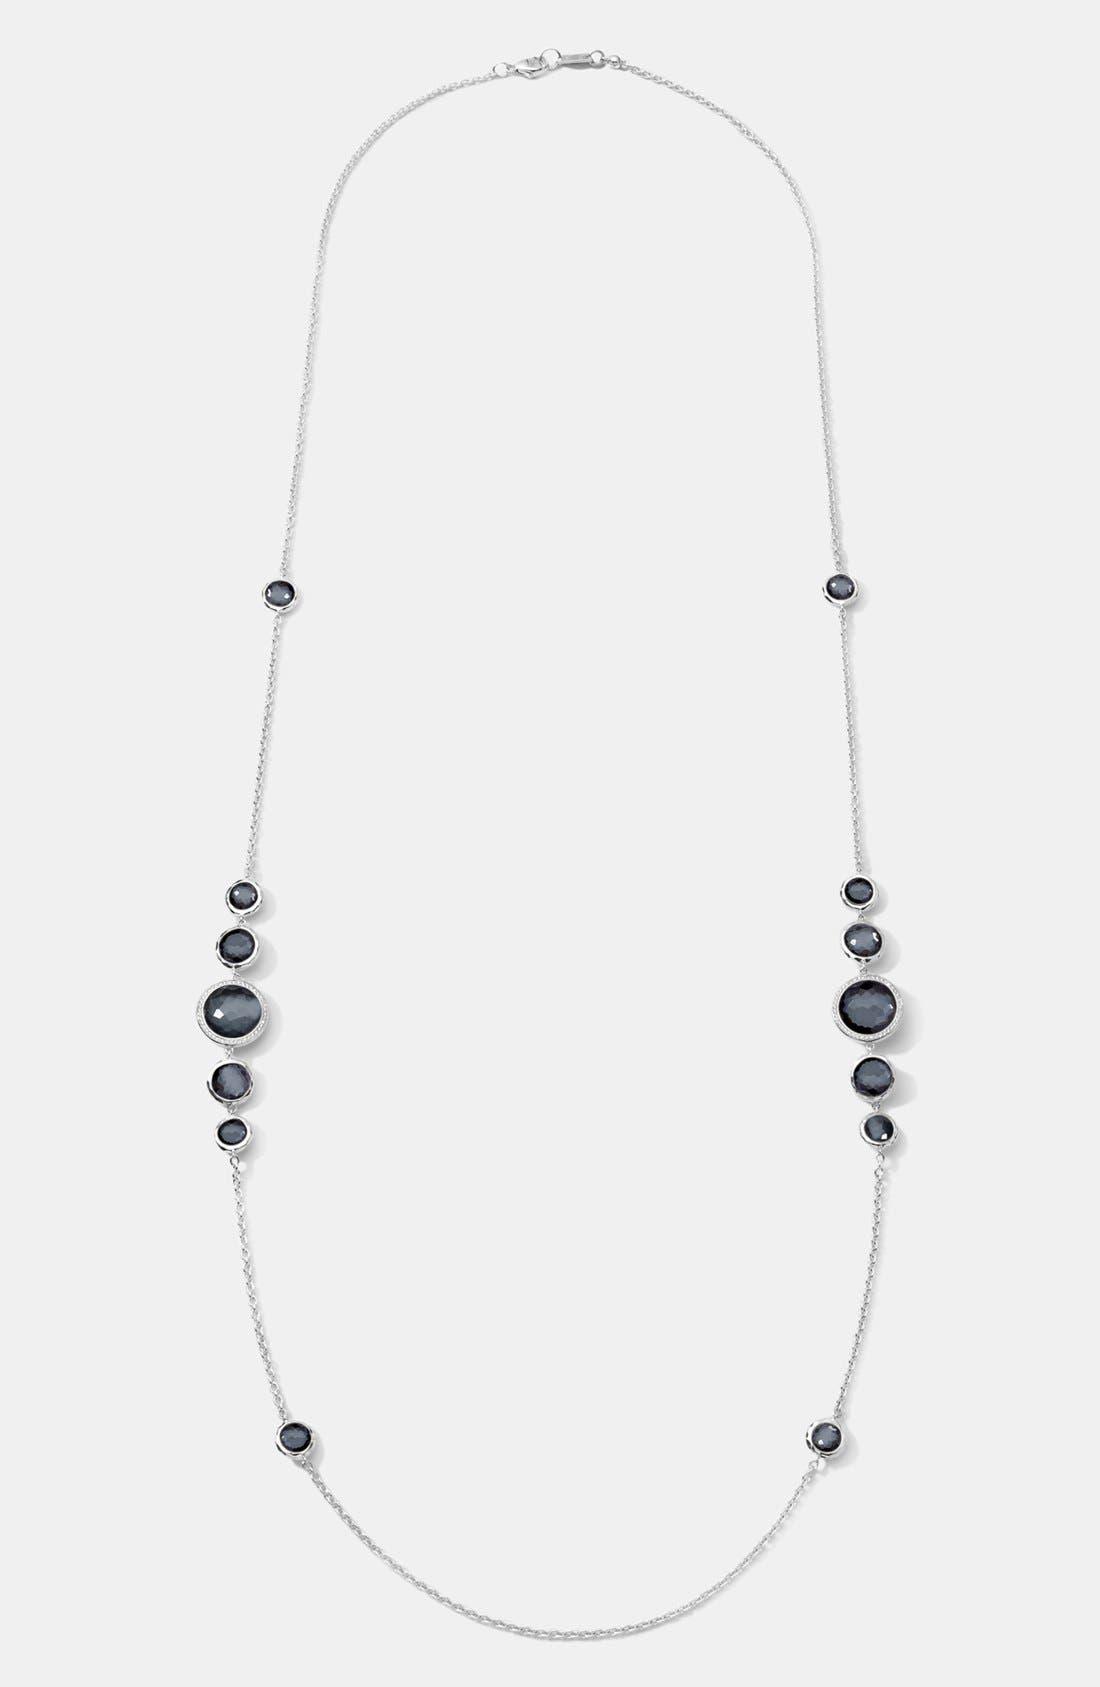 Alternate Image 1 Selected - Ippolita 'Stella' Long Station Necklace